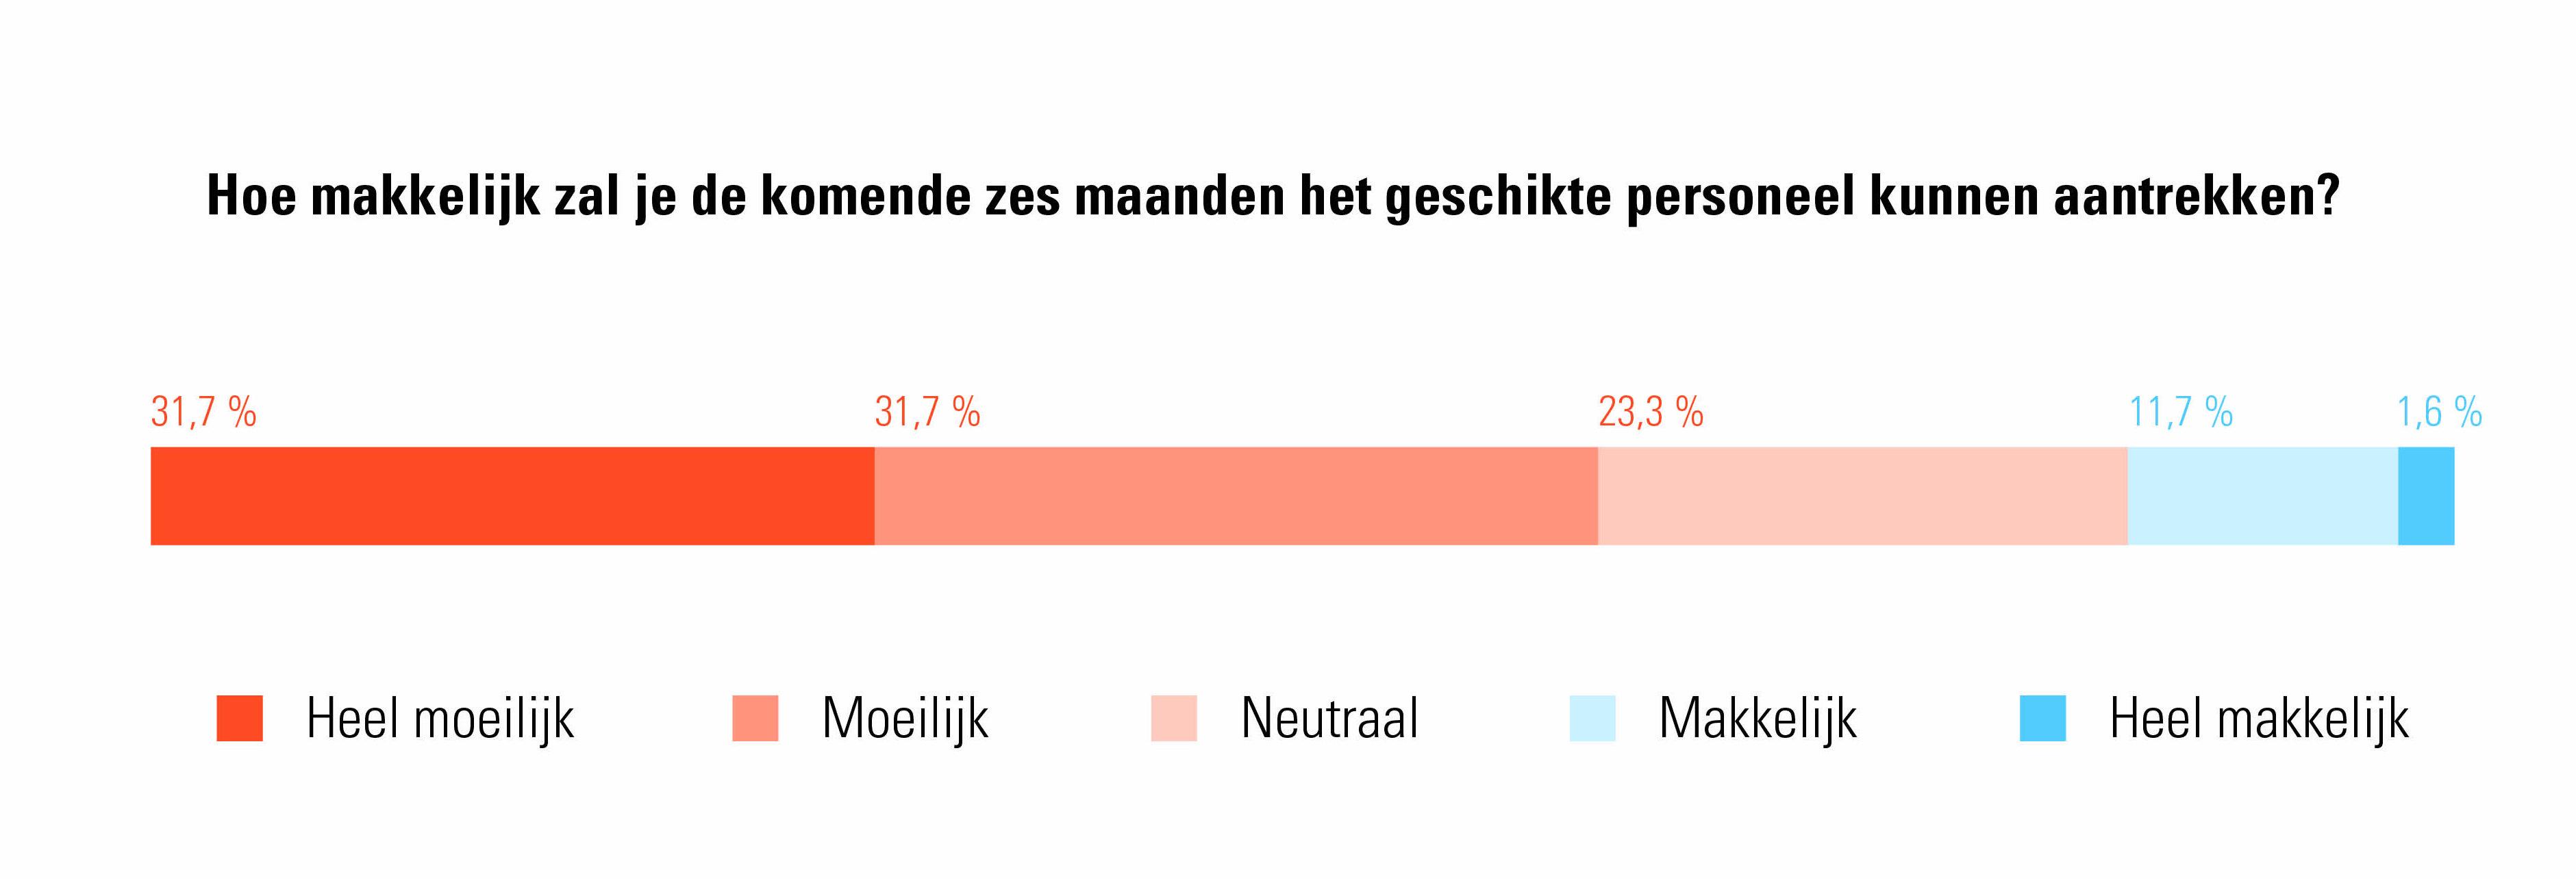 Inschatting rekruteringssucces Limburgse kmo's - kmo-werkbarometer Acerta 2021